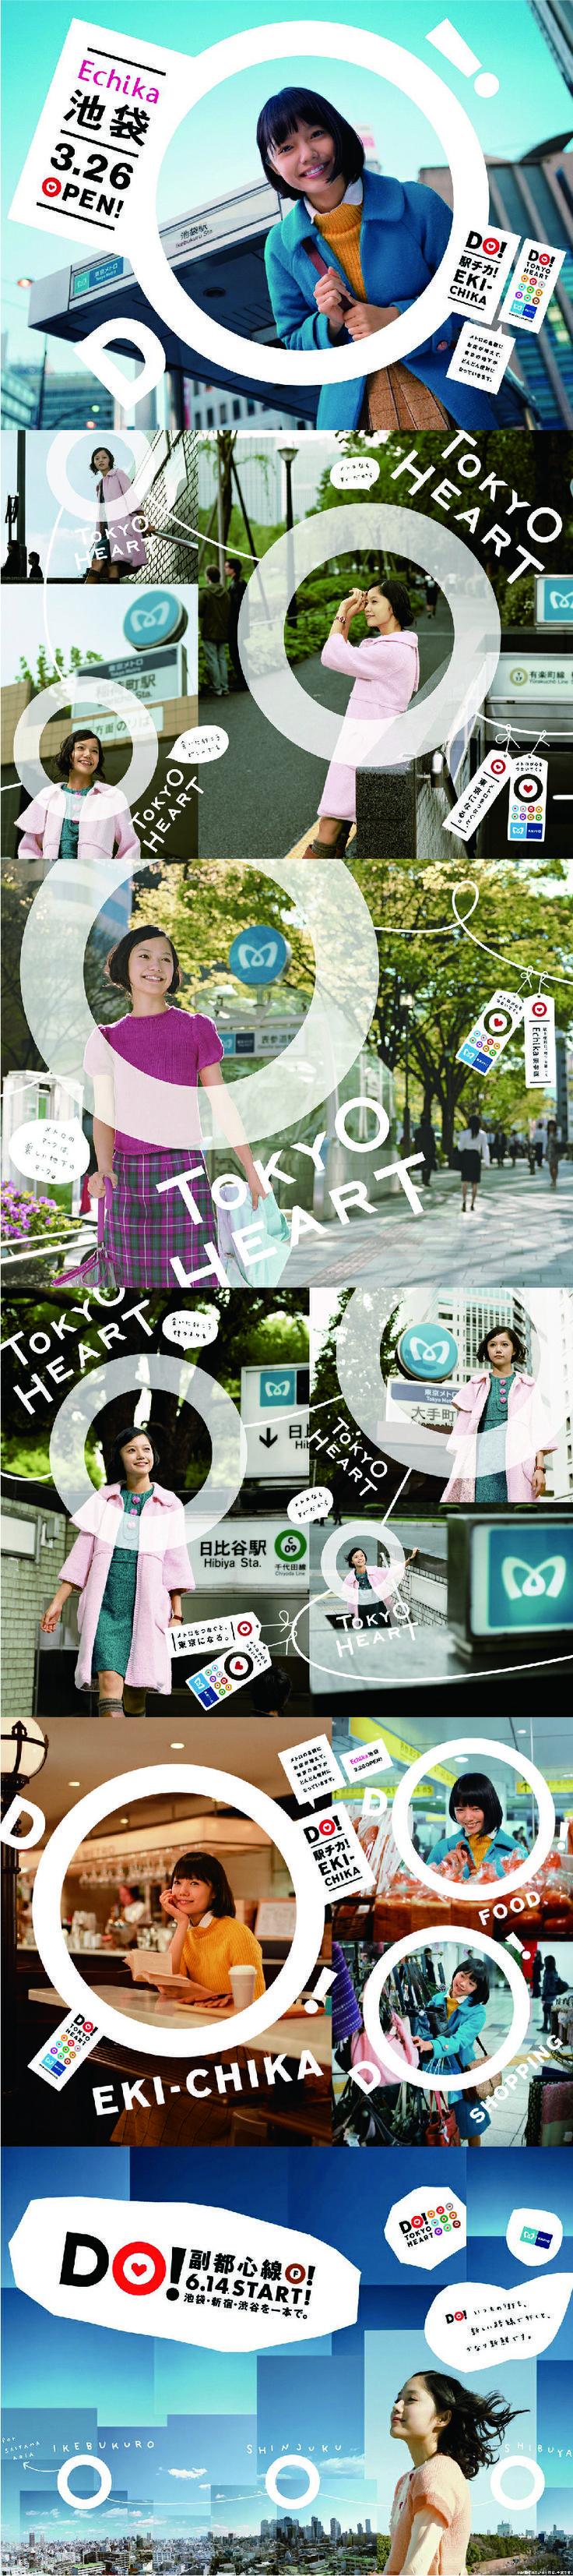 advertising | 宮﨑あおい TOKYO HREAT(東京メトロ) | DO! TOKYO HEART|エチカ池袋篇 #japan #japanese #advertising: